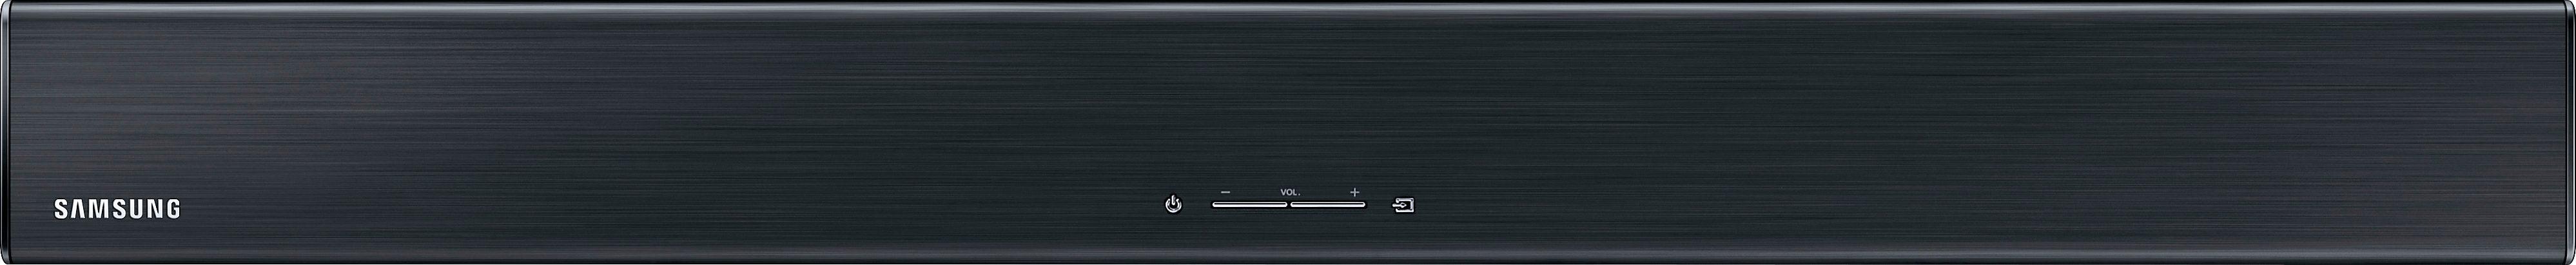 Samsung HW-J250/EN Soundbar mit Bluetooth